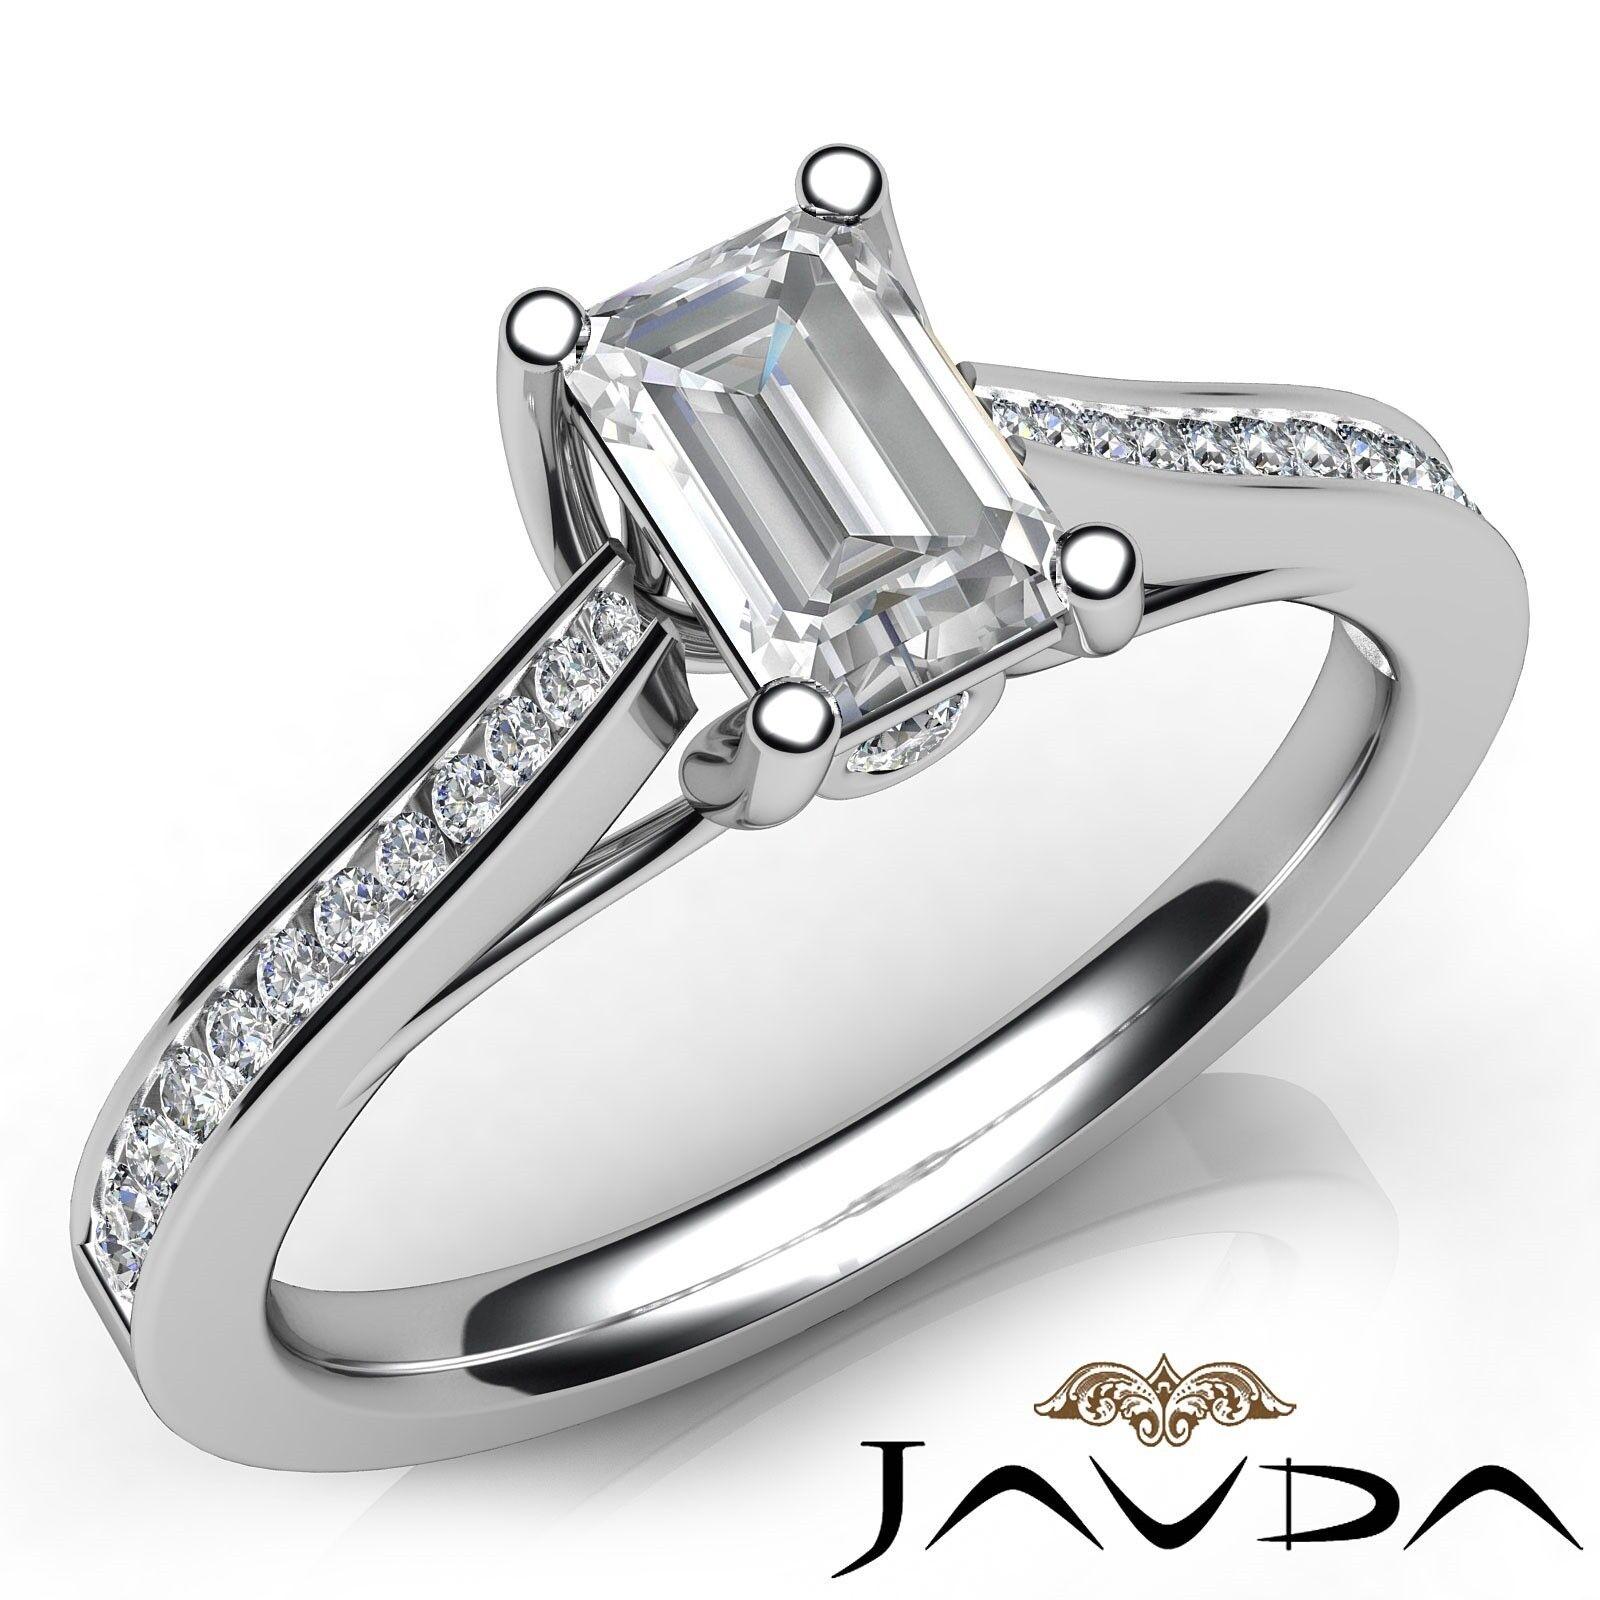 1.2ctw Channel Set Stone Emerald Diamond Engagement Ring GIA I-VS2 White Gold